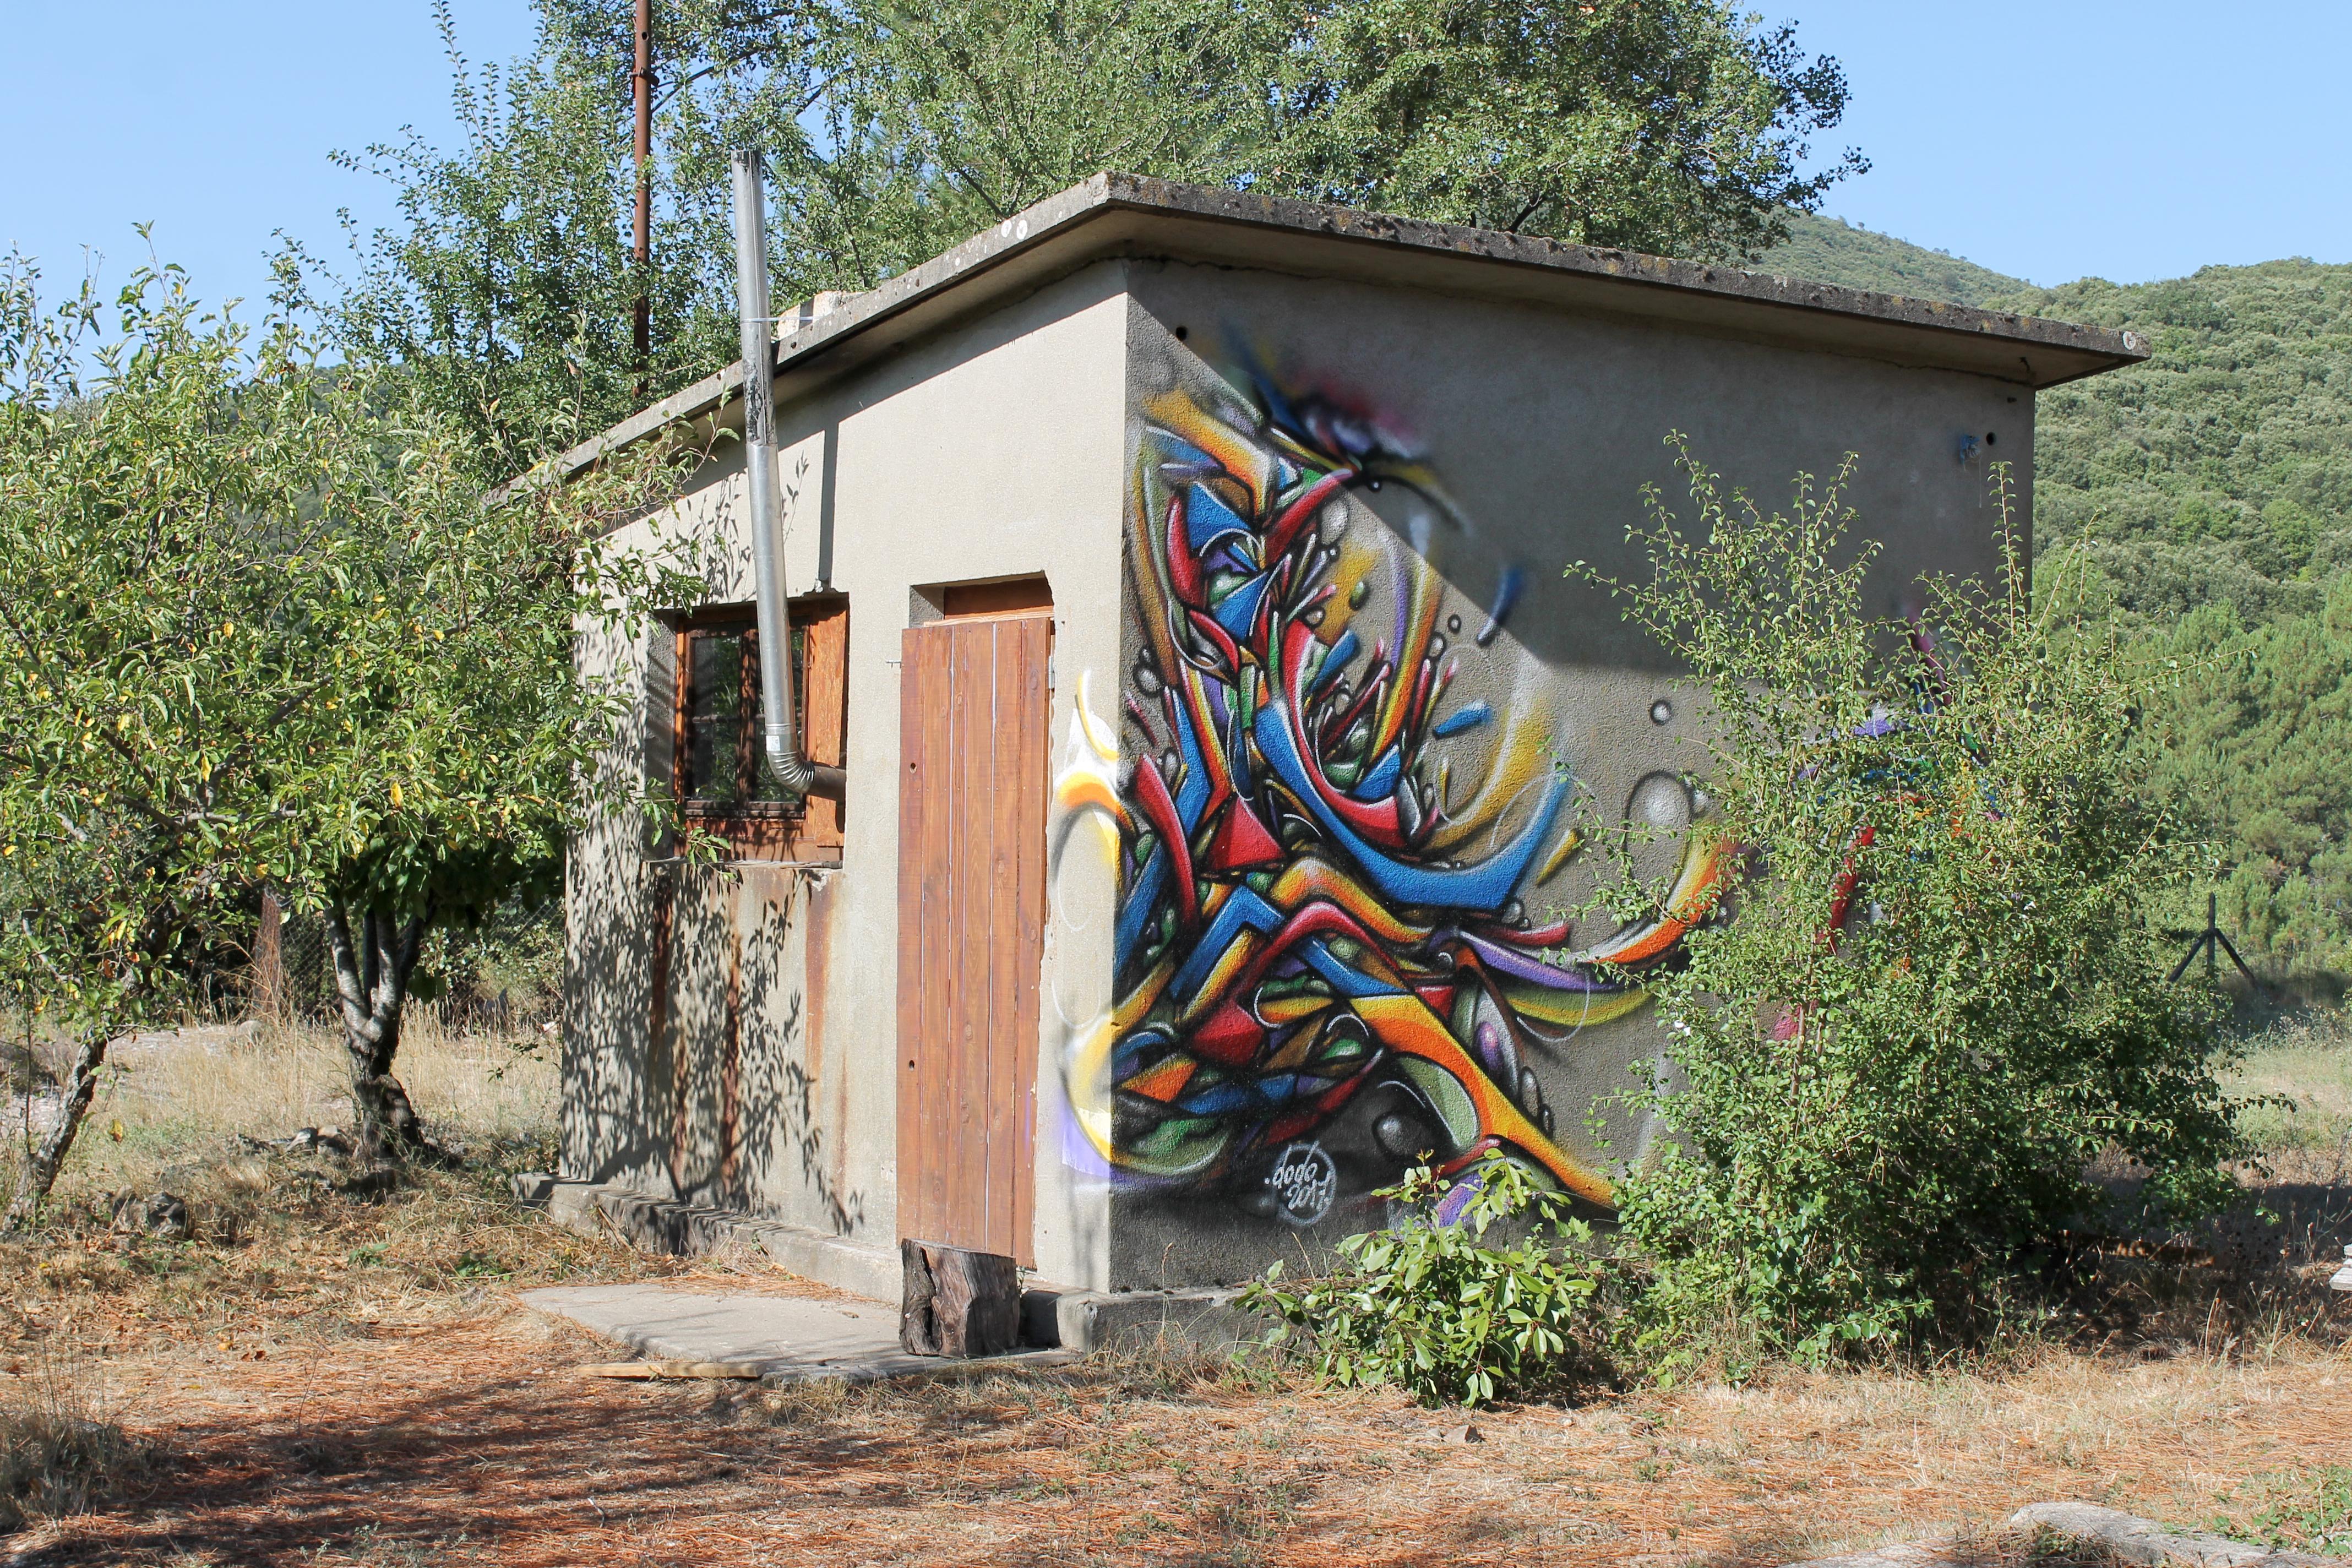 Graffiti Cévennes été 2017